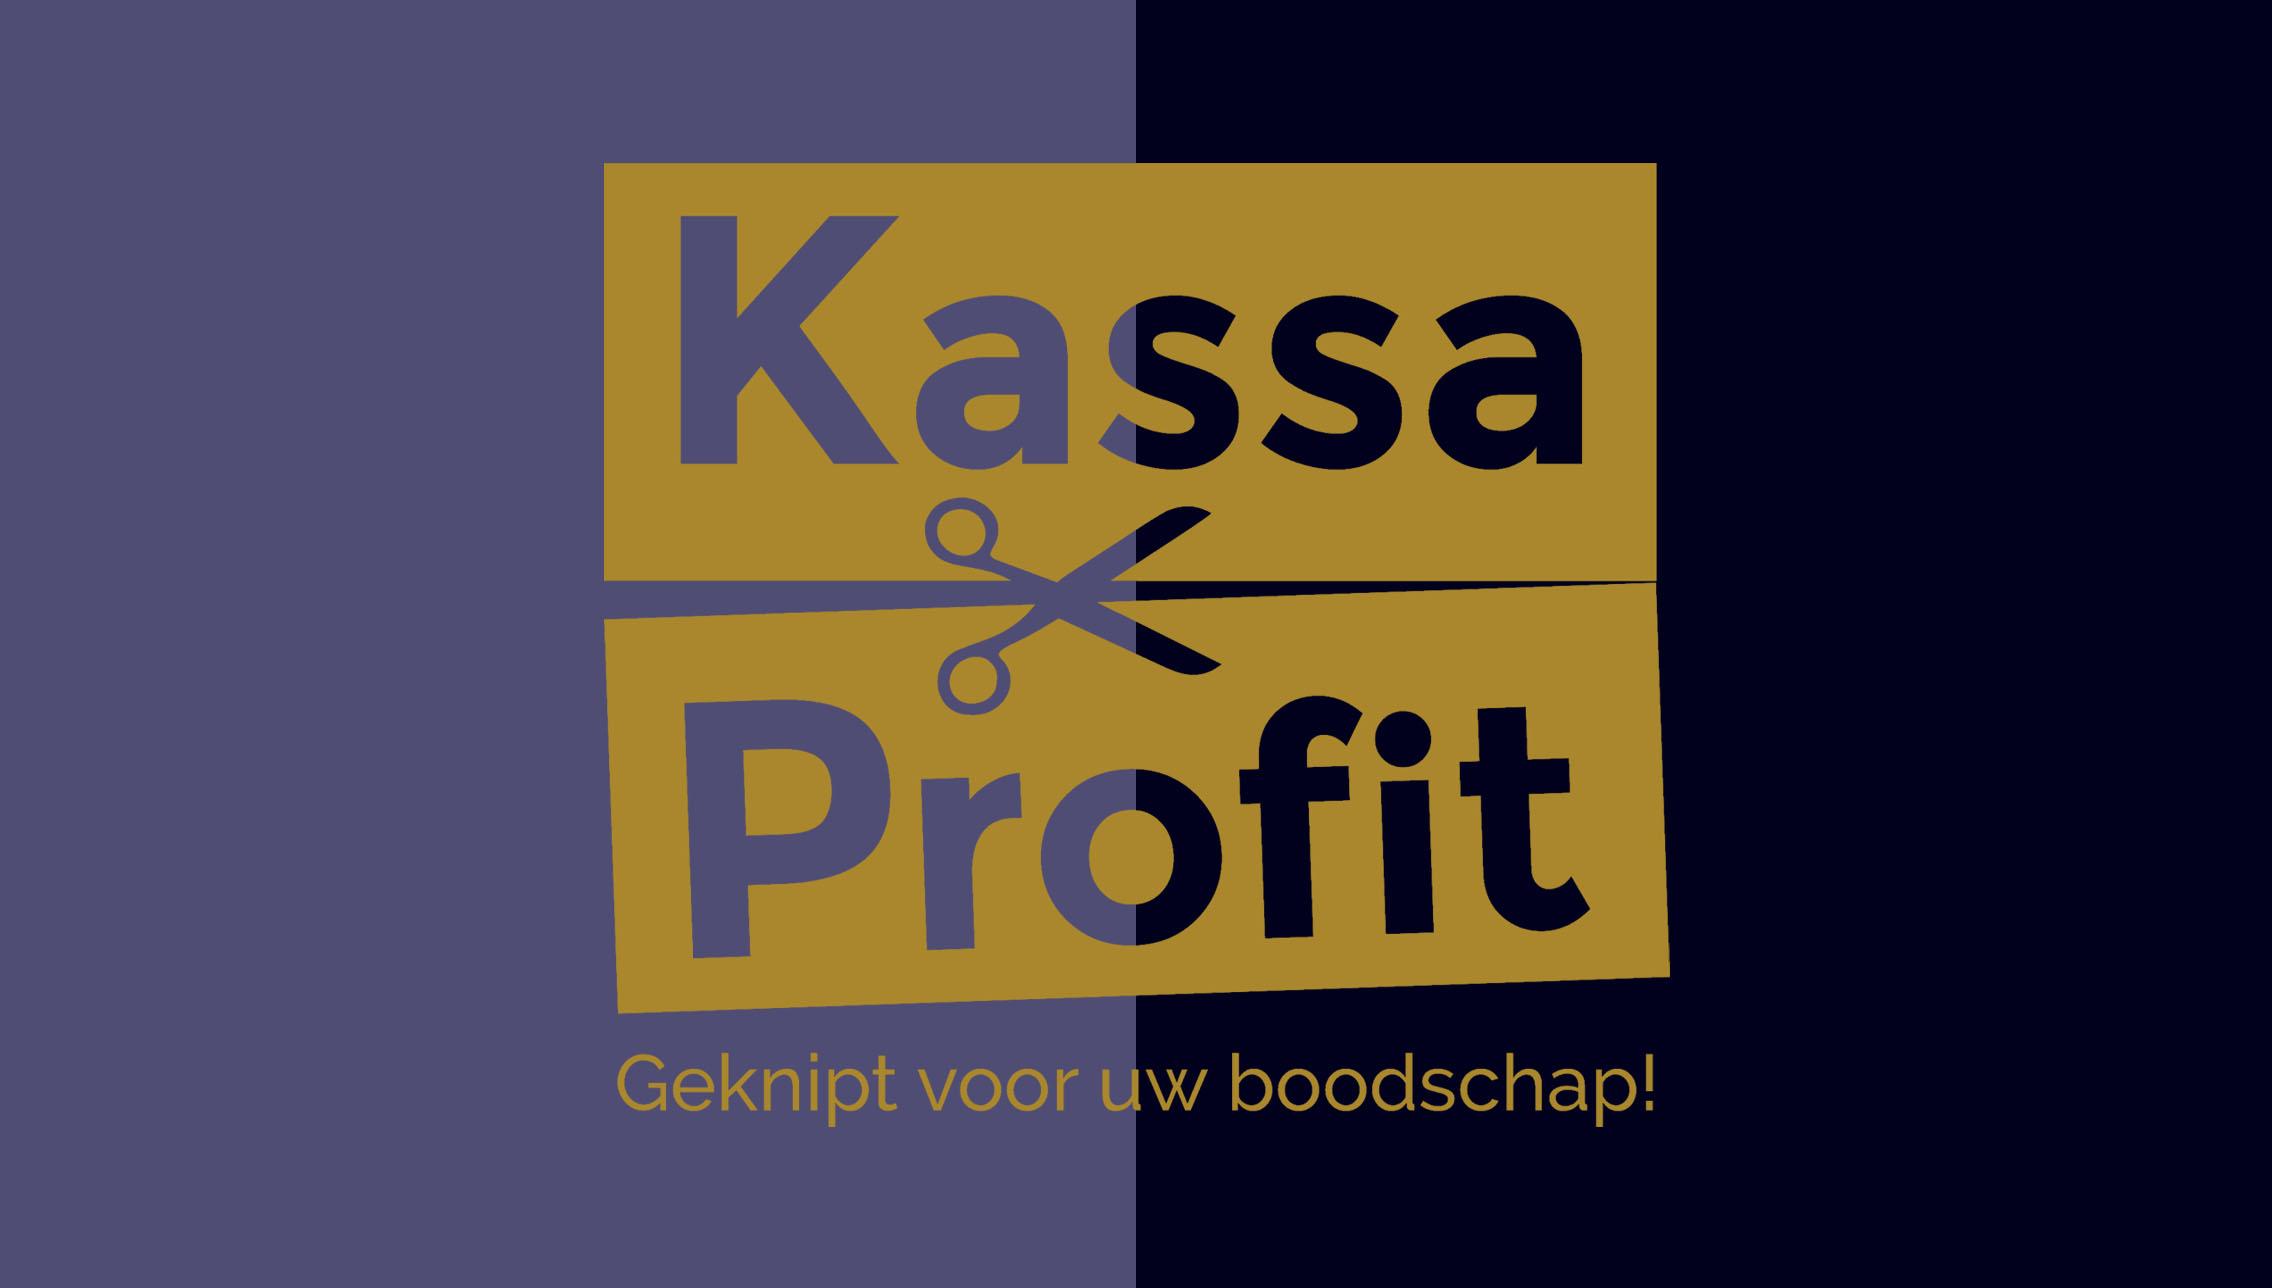 Kassa Profit